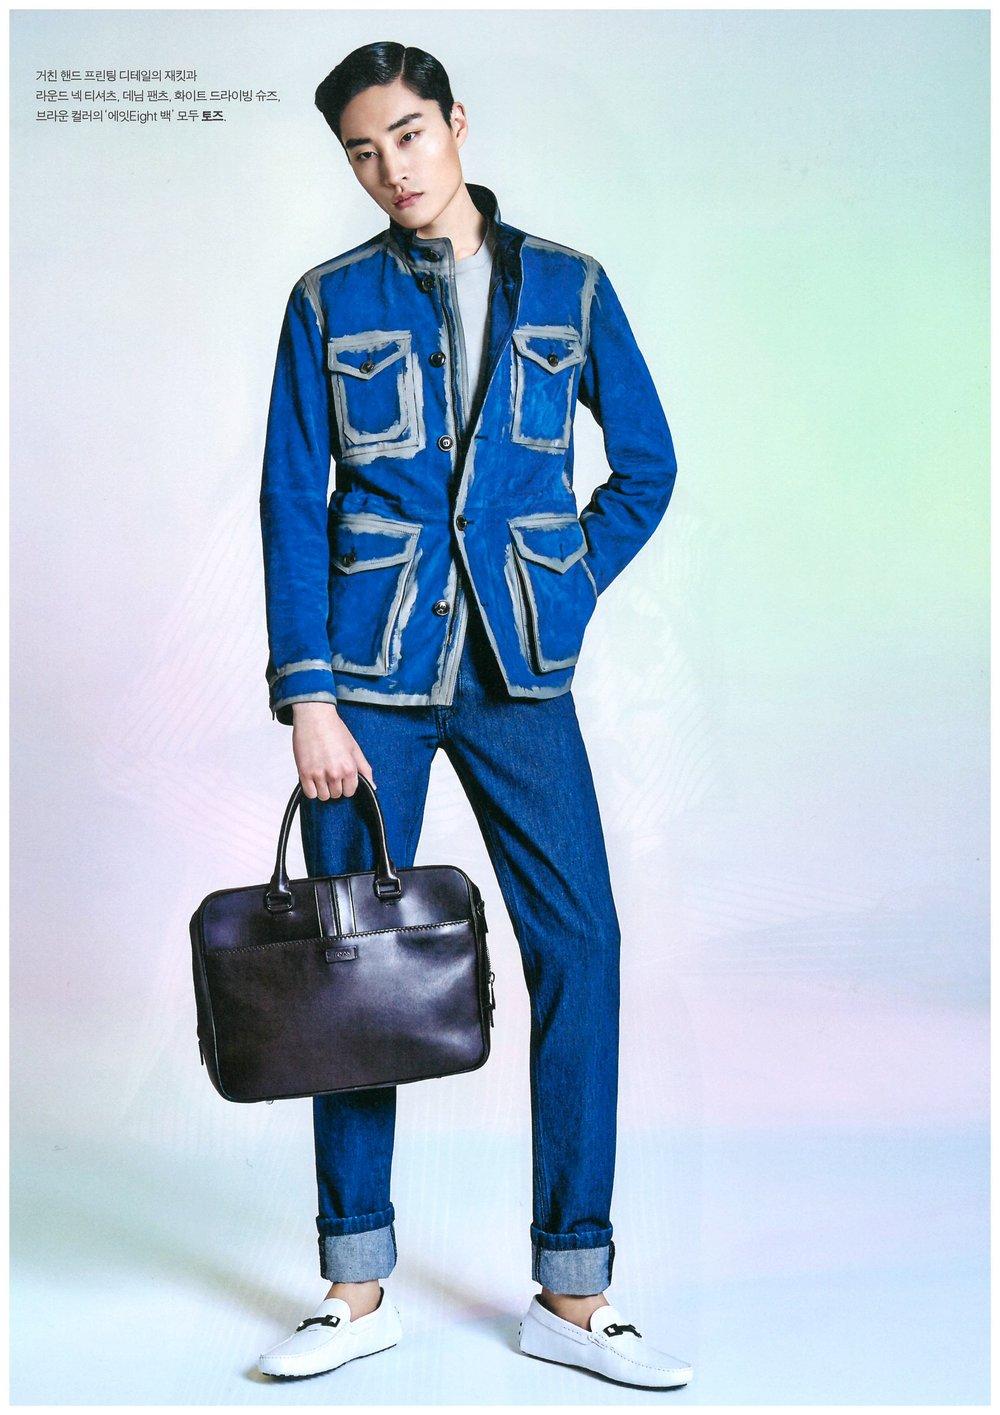 2016.03 Style H_Wankyu Ryu_P Jieun Jung_E Jieun Kim_M Hyunsup Shim_H Sunhee Kim (1).jpg